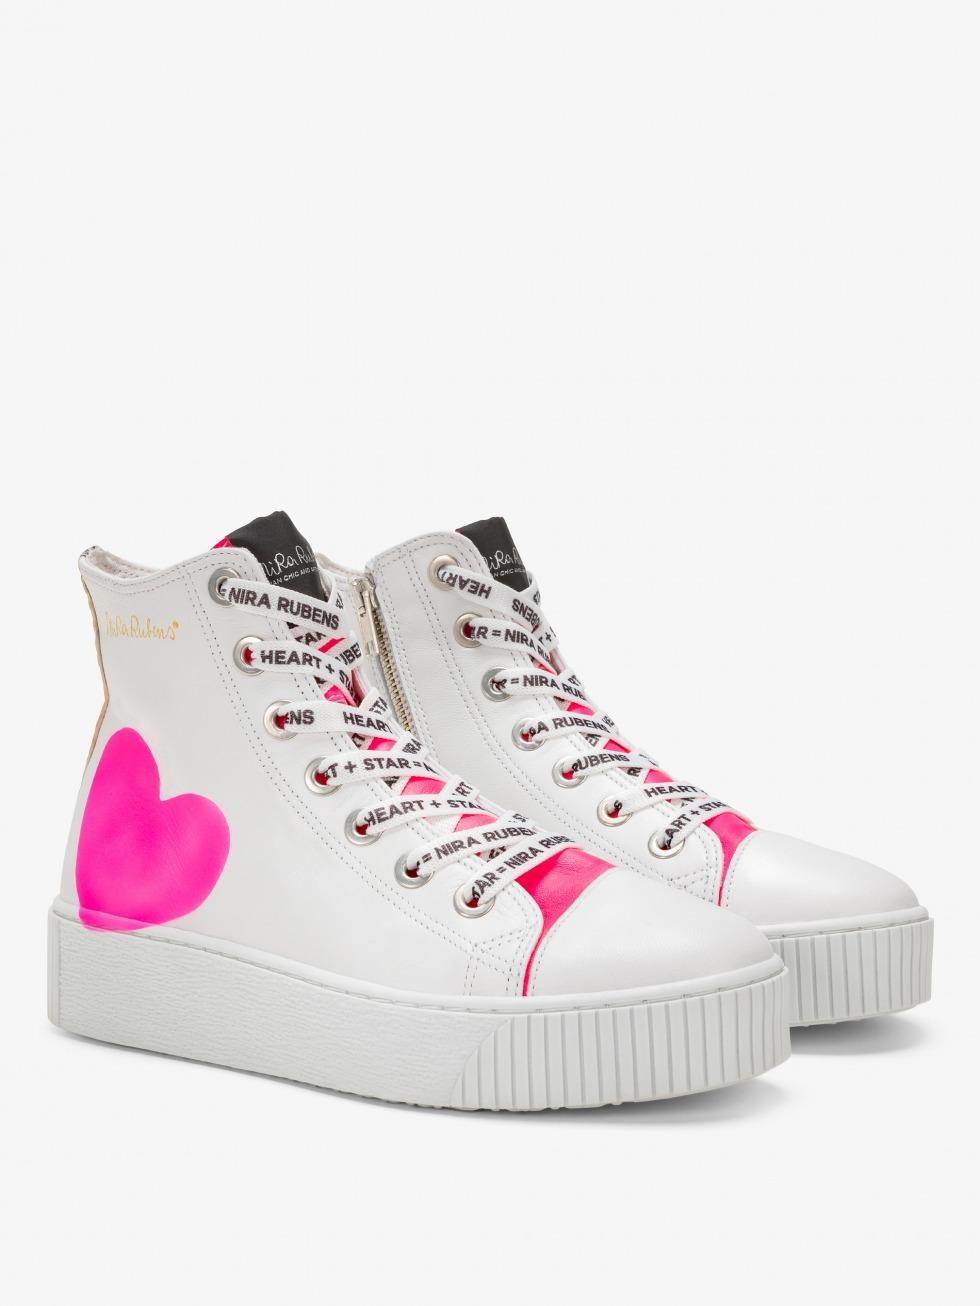 Long Island Sneakers - Neon Python Heart